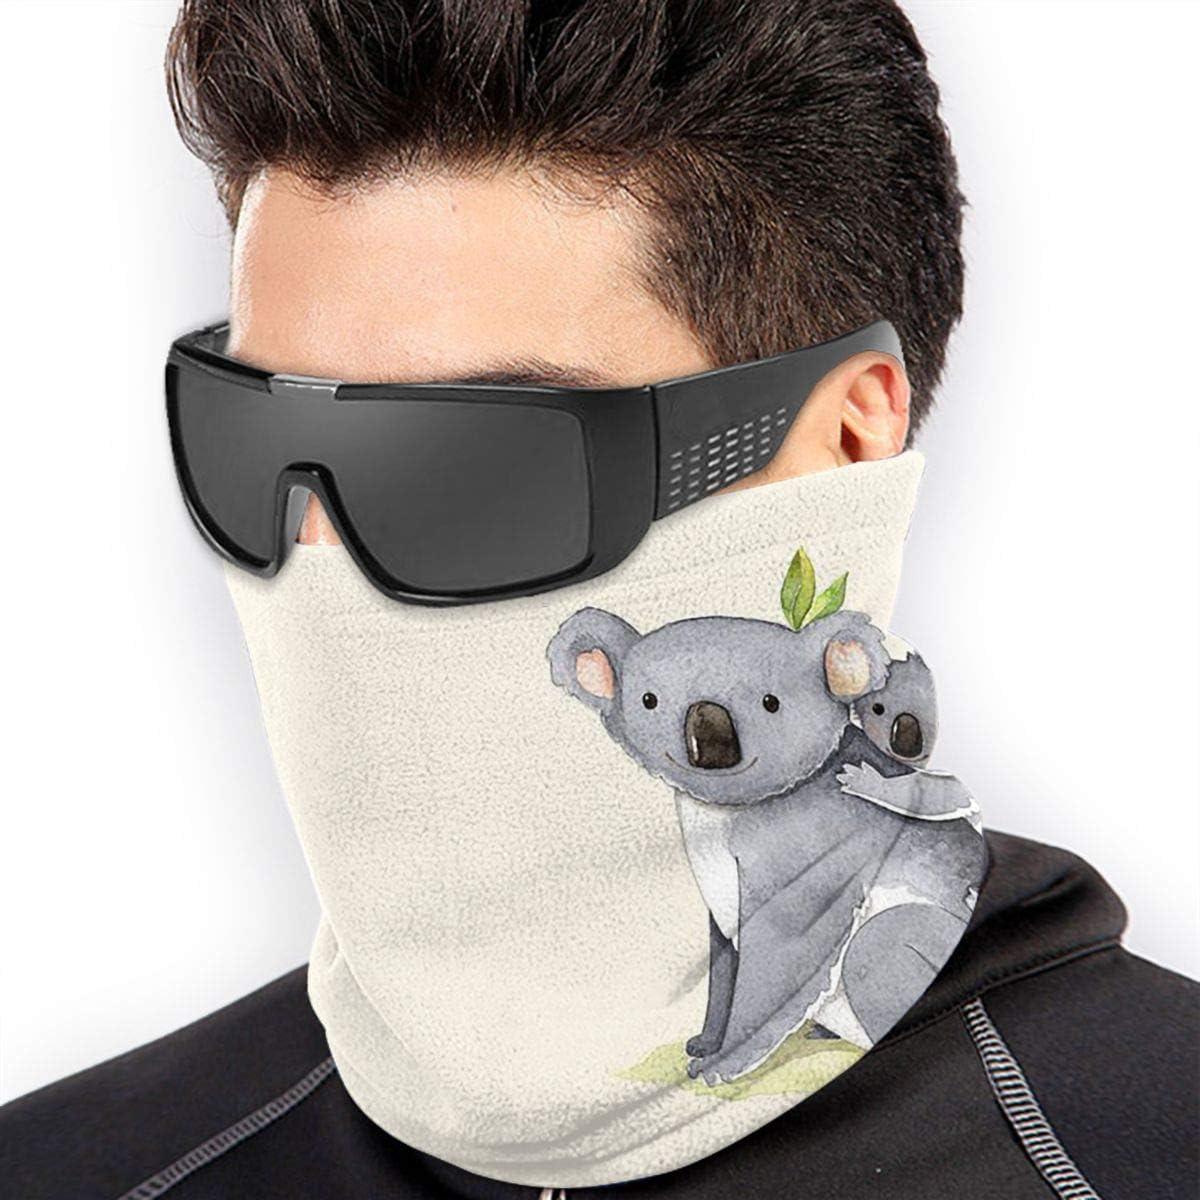 Koala Baby Neck Gaiter Headwear Headband Head Wrap Scarf Mask Neck/Ear Warmers Headbands Perfect For Winter Fishing, Hiking, Running, Motorcycle Etc& Daily Wear For Men And Women